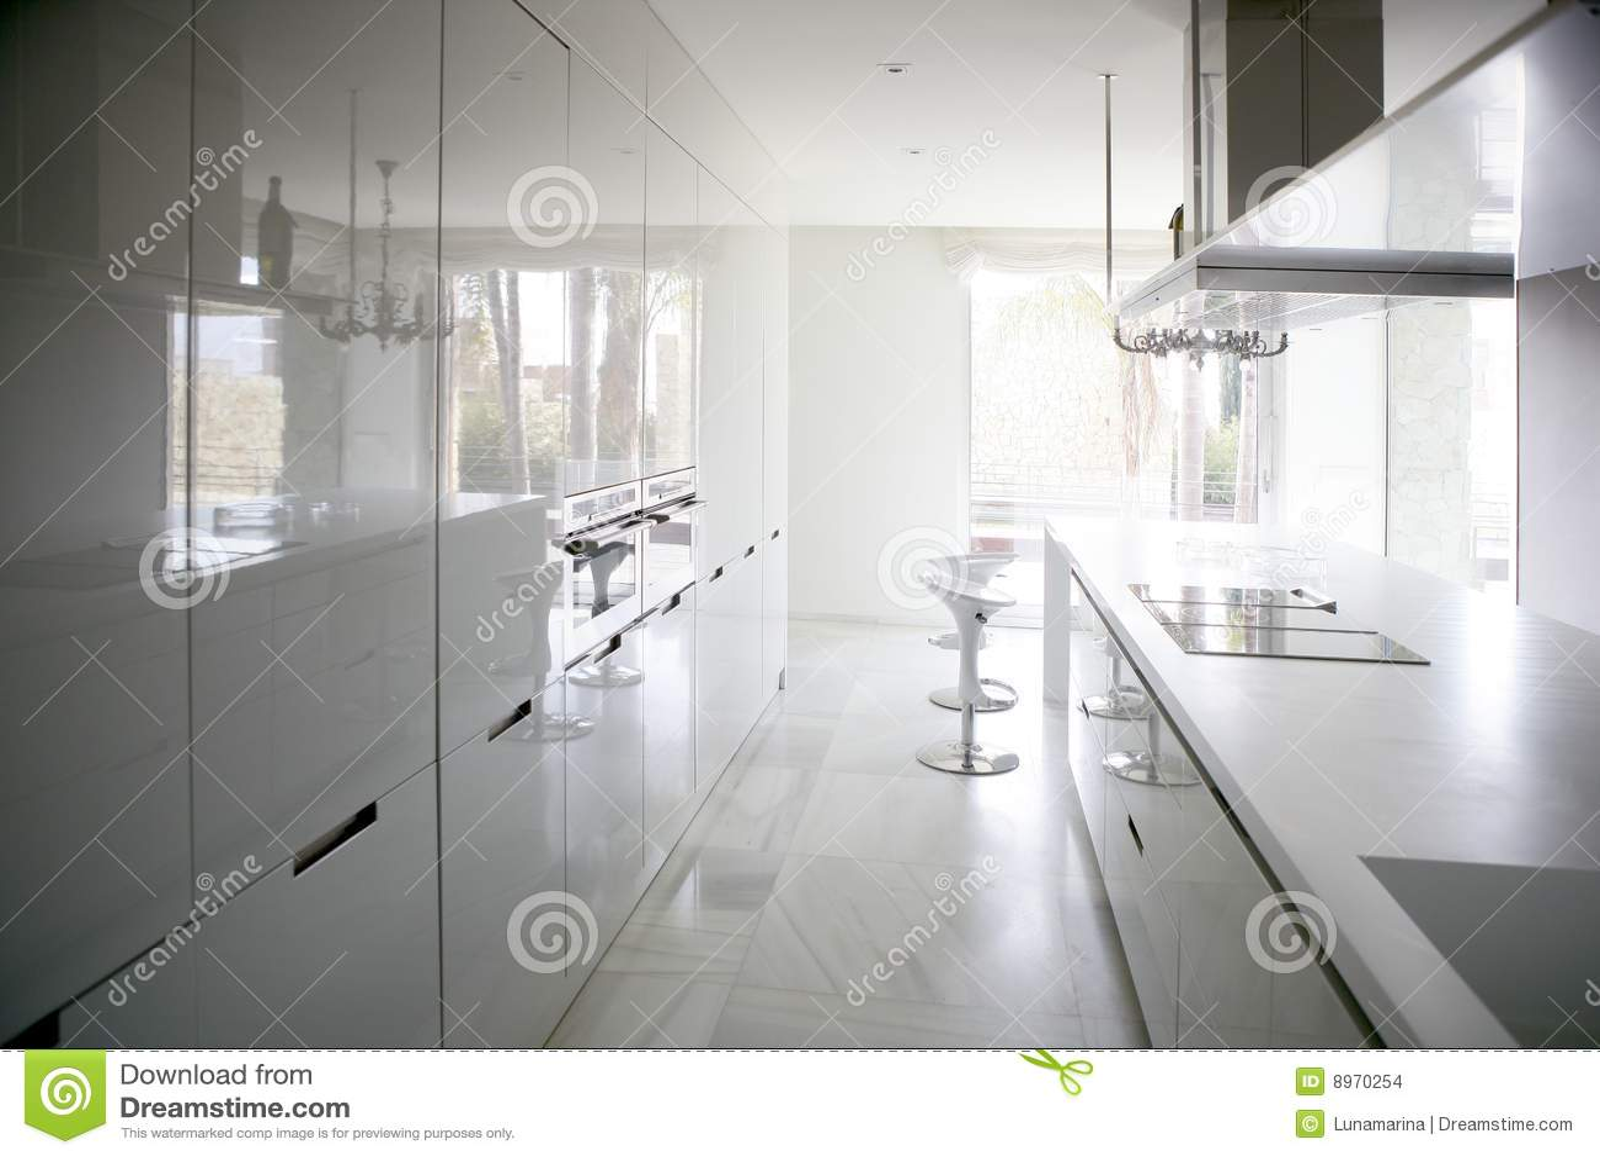 Grote moderne eigentijdse witte keuken stock afbeeldingen beeld 8970254 - Beeld van eigentijdse keuken ...